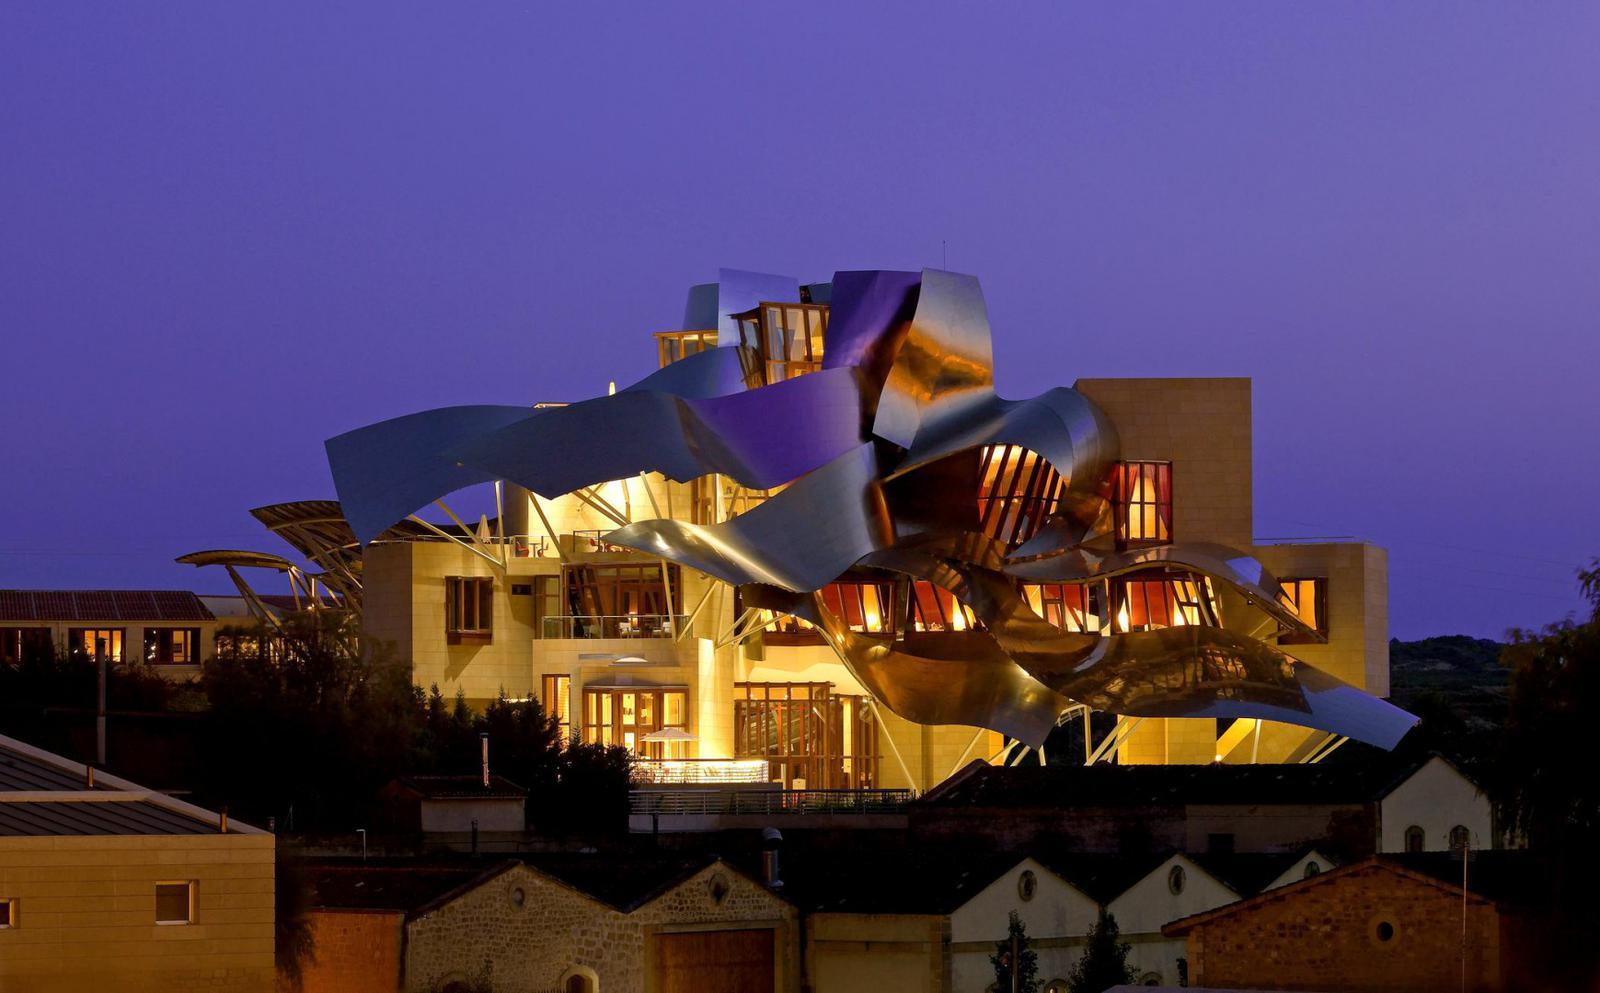 hoteles impresionantes Hotel Marqués de Riscal